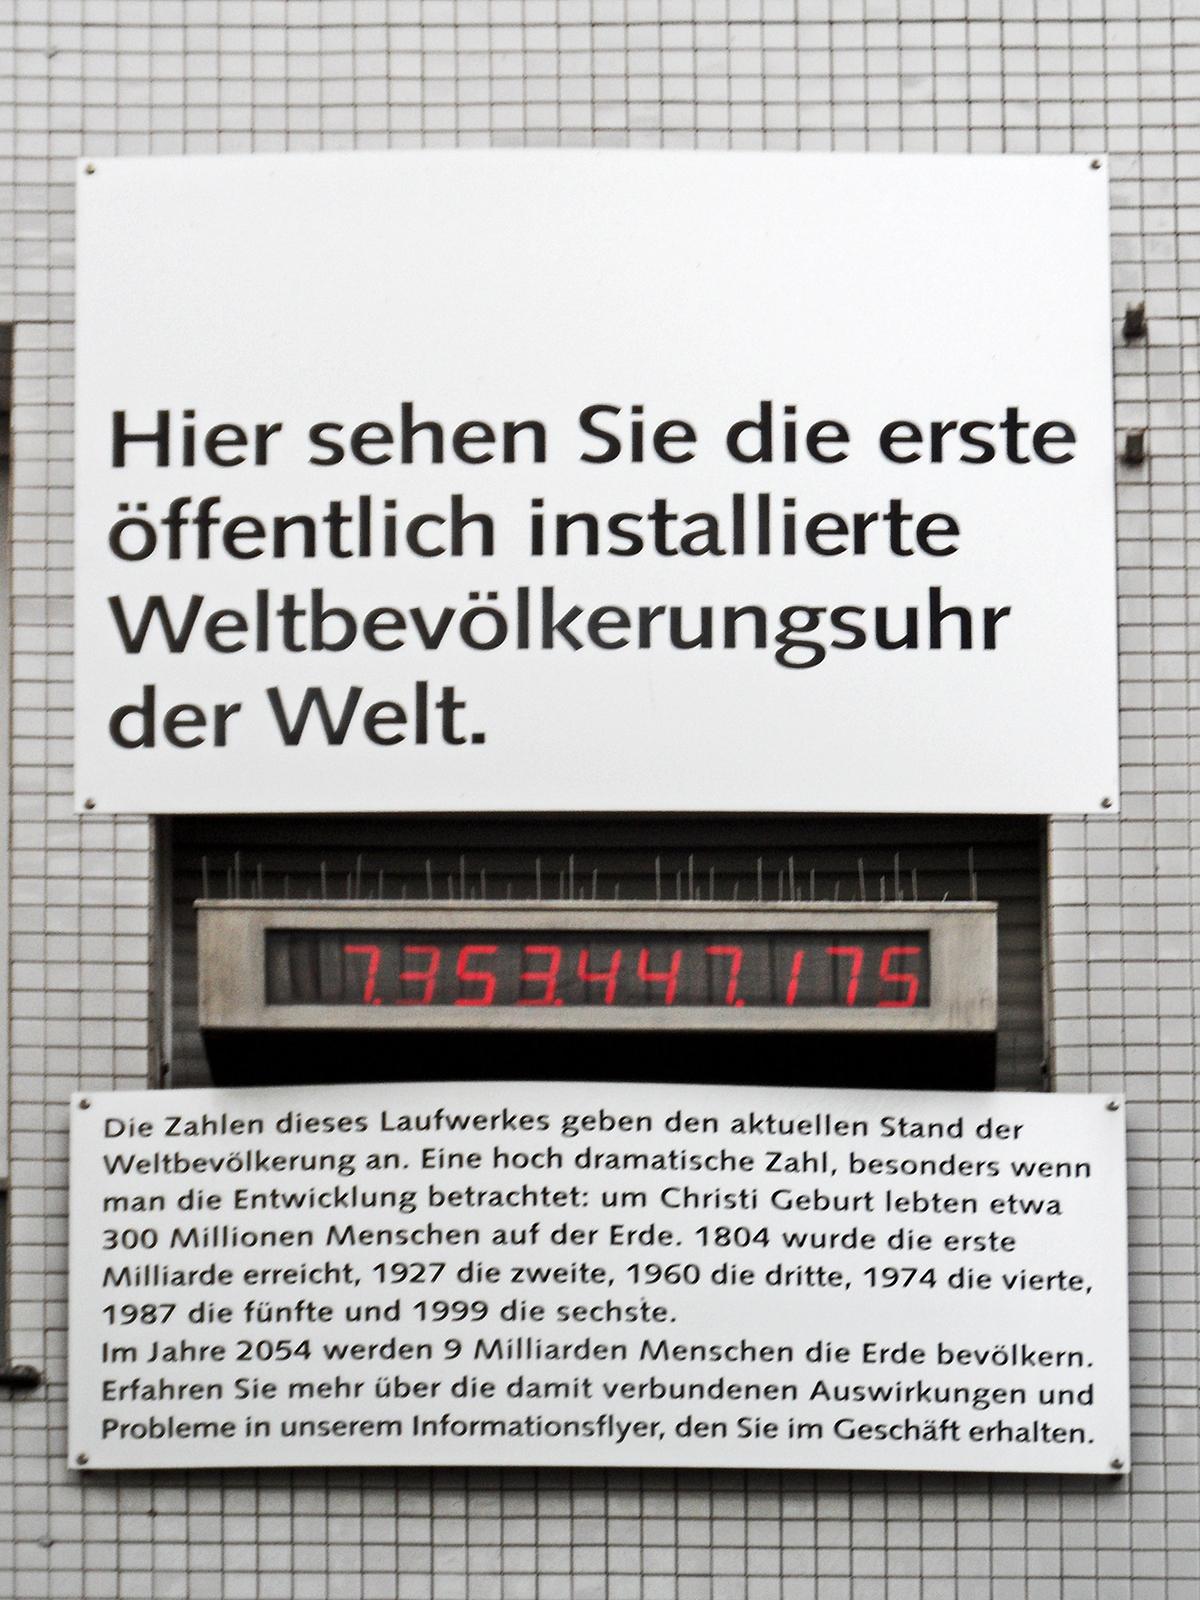 Wuppertaler Uhrenmuseum, Weltbevölkeringsuhr, februari 2016. Foto met dank aan onnola, CC BY-SA 2.0